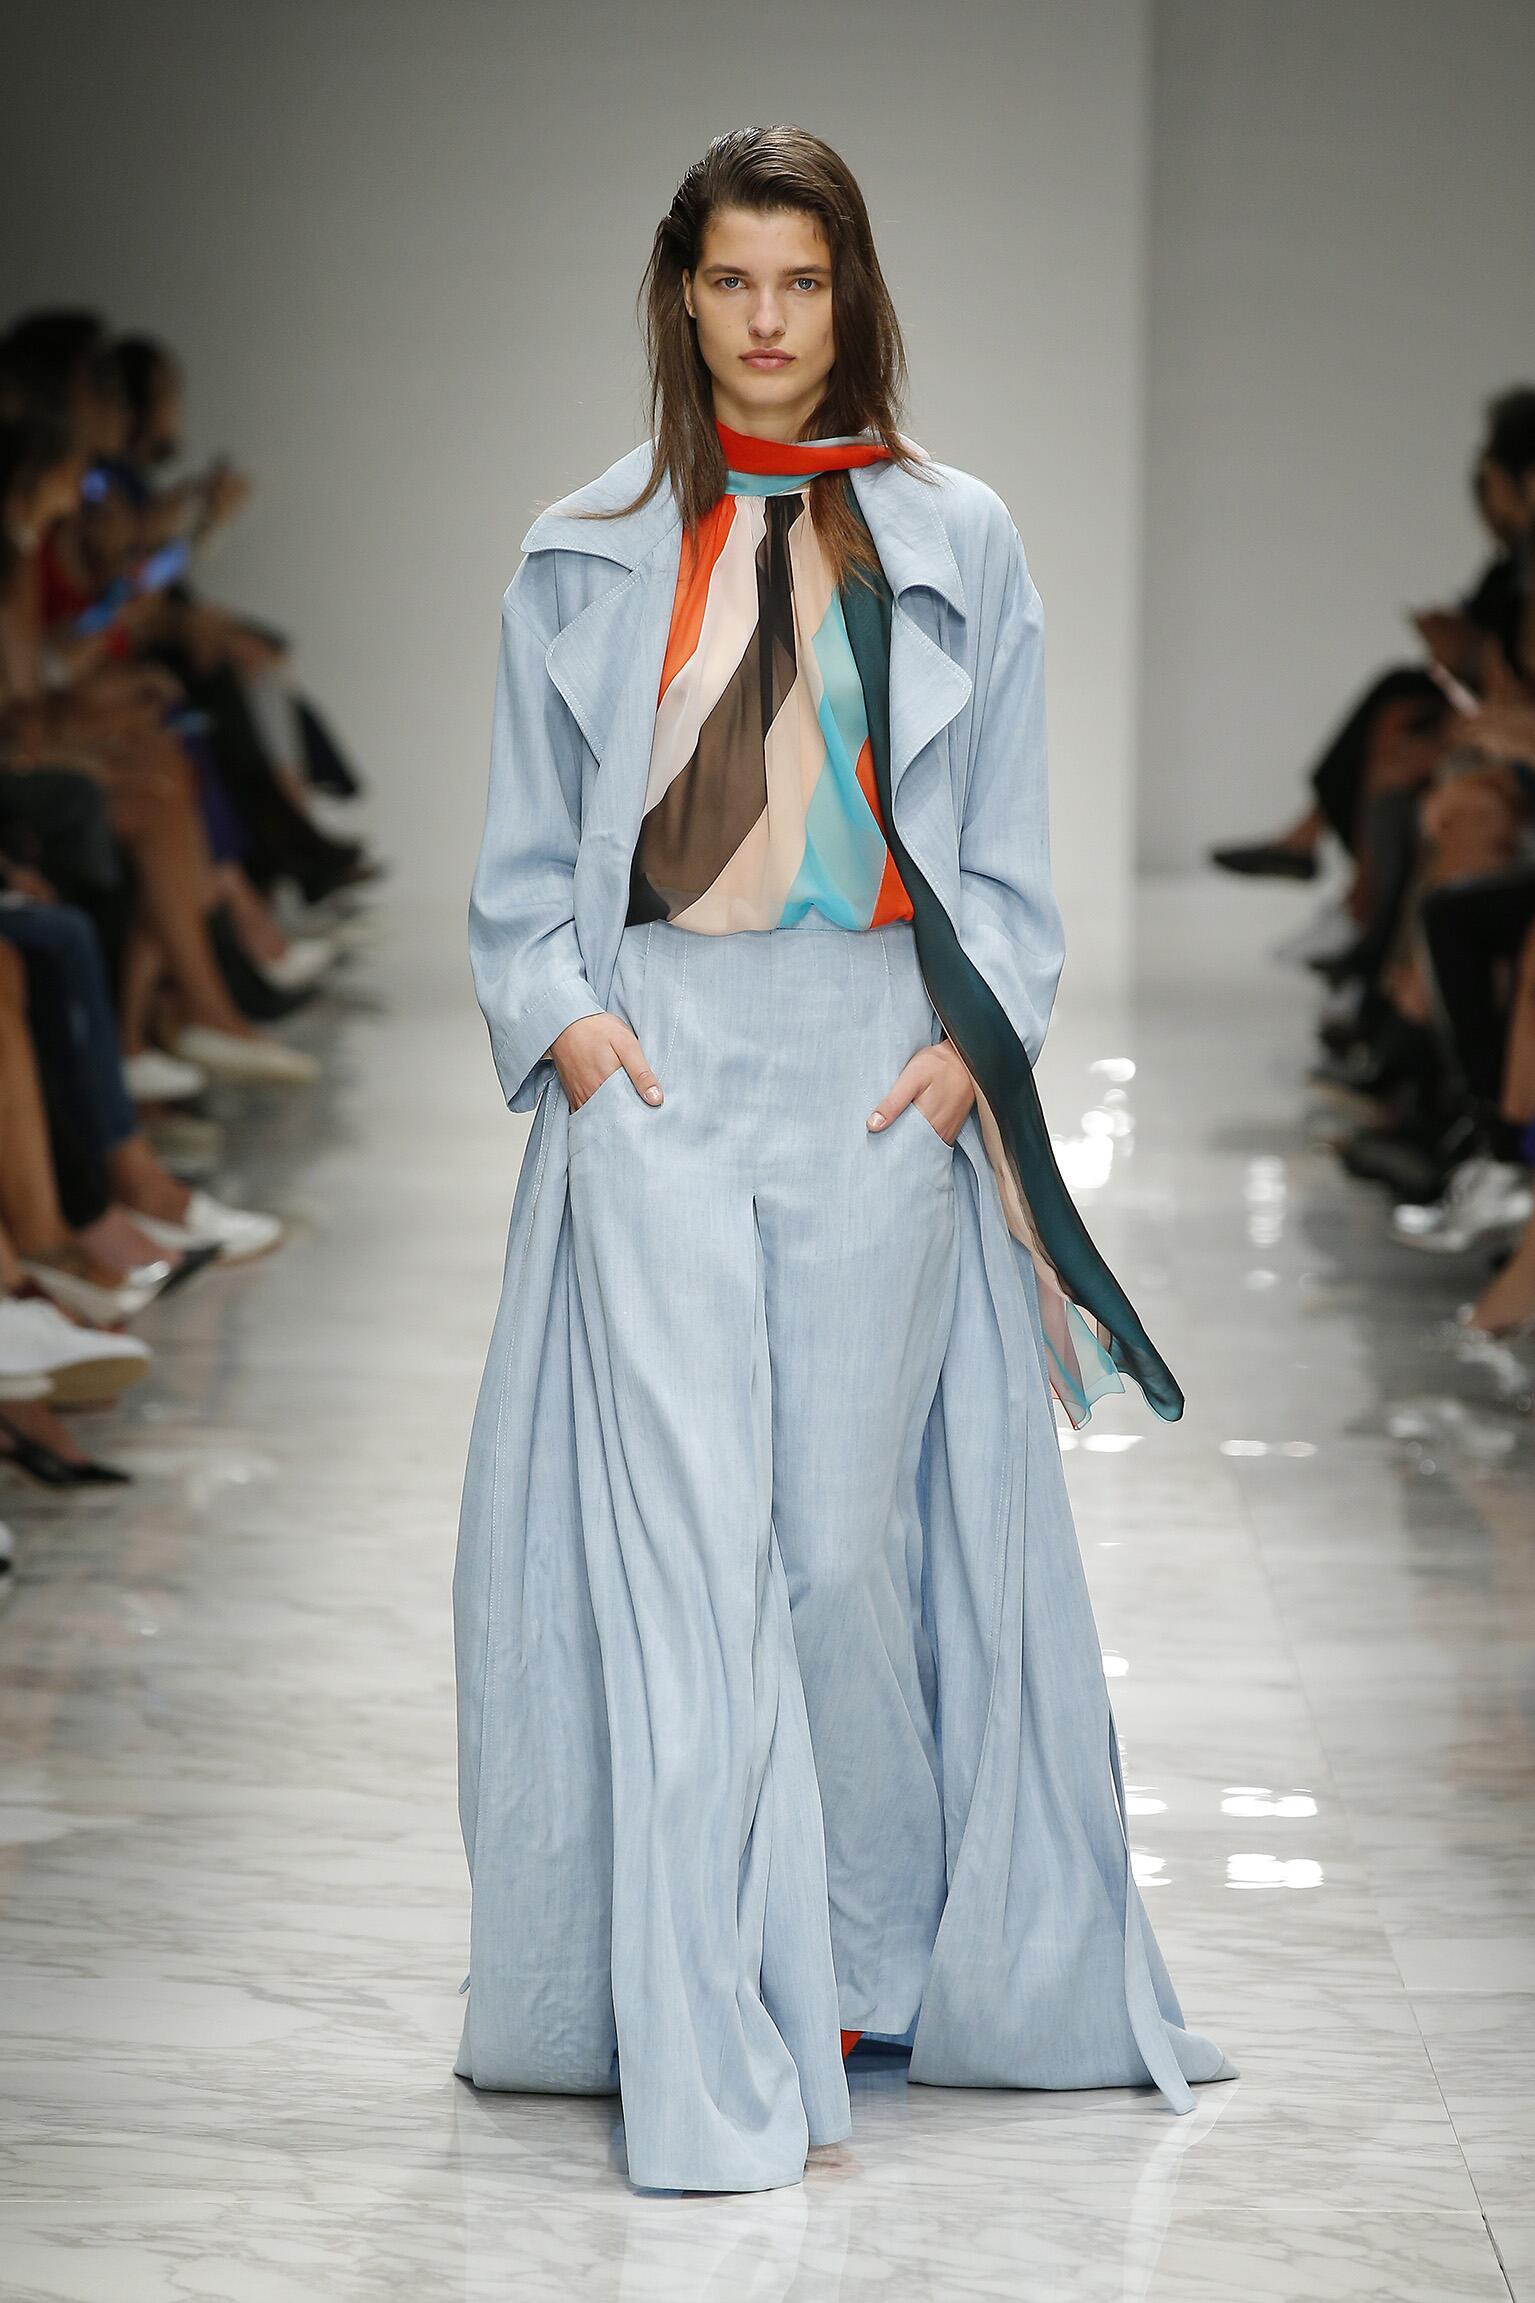 Catwalk Blumarine Woman Fashion Show Summer 2016